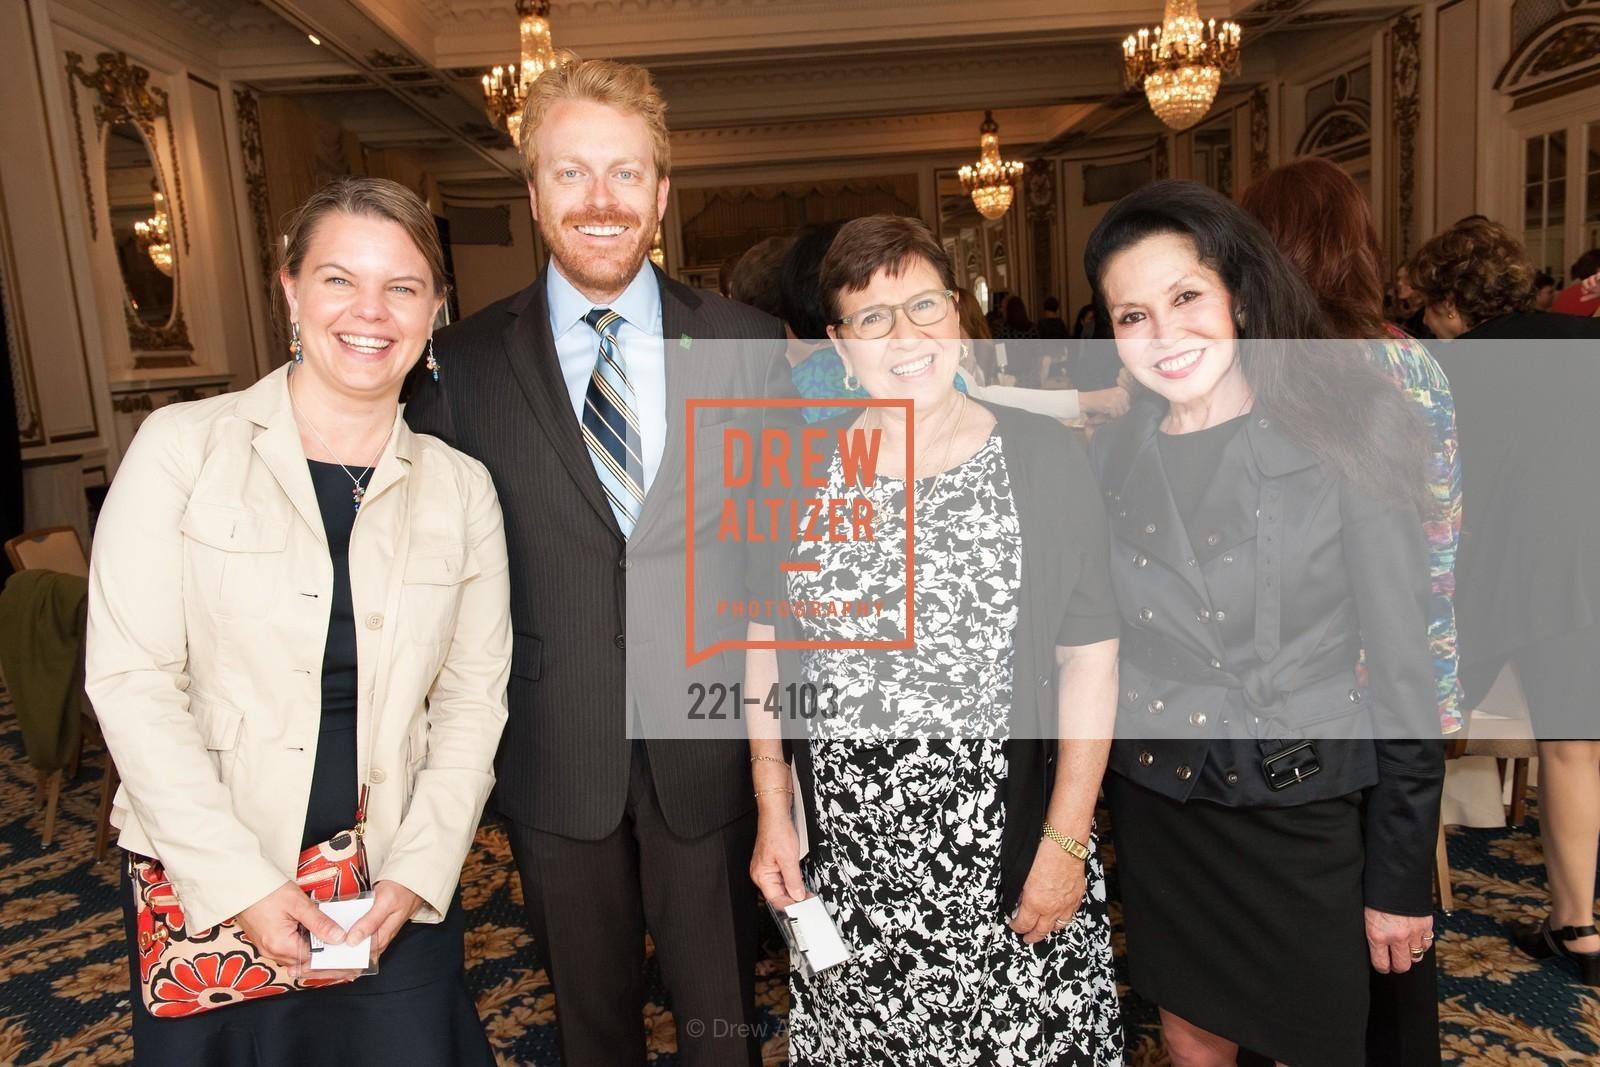 Jessica Jordan, Jay Dillon, Janice Mirikitani, Photo #221-4103